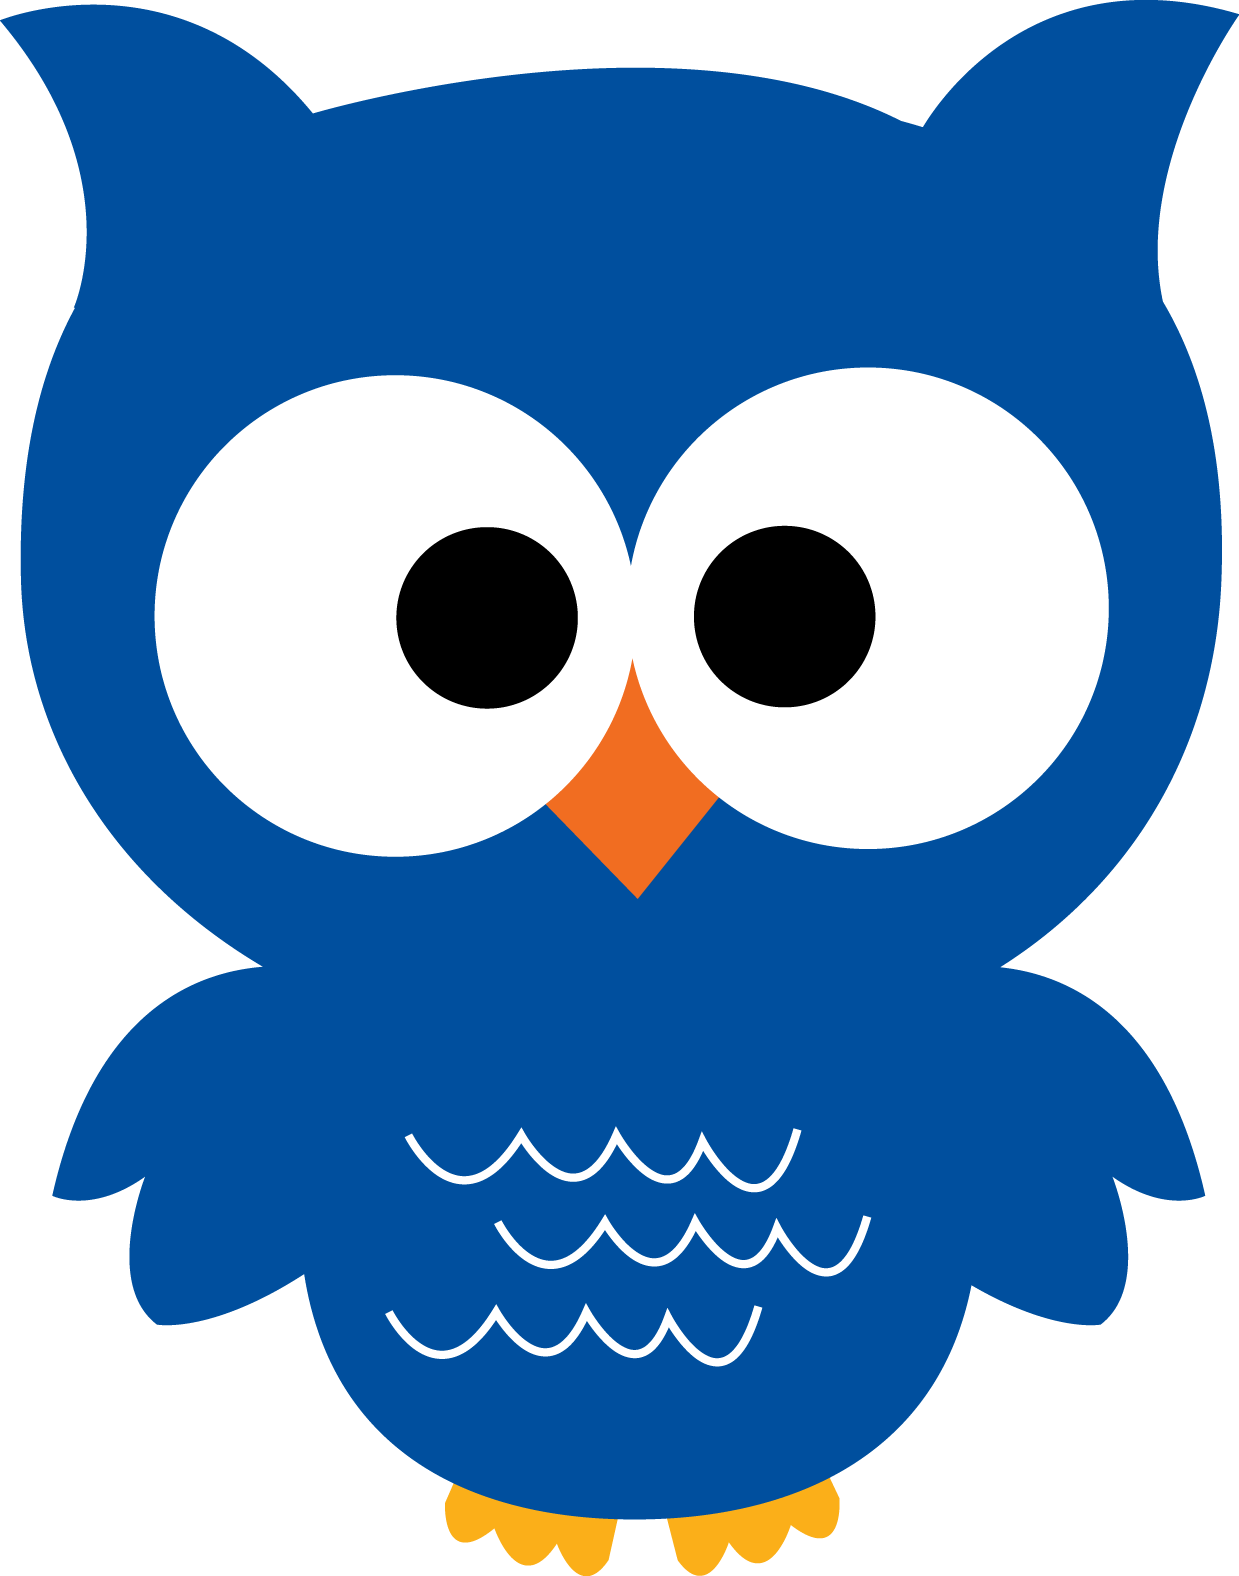 Owls clipart wallpaper. Owl blue png buscar